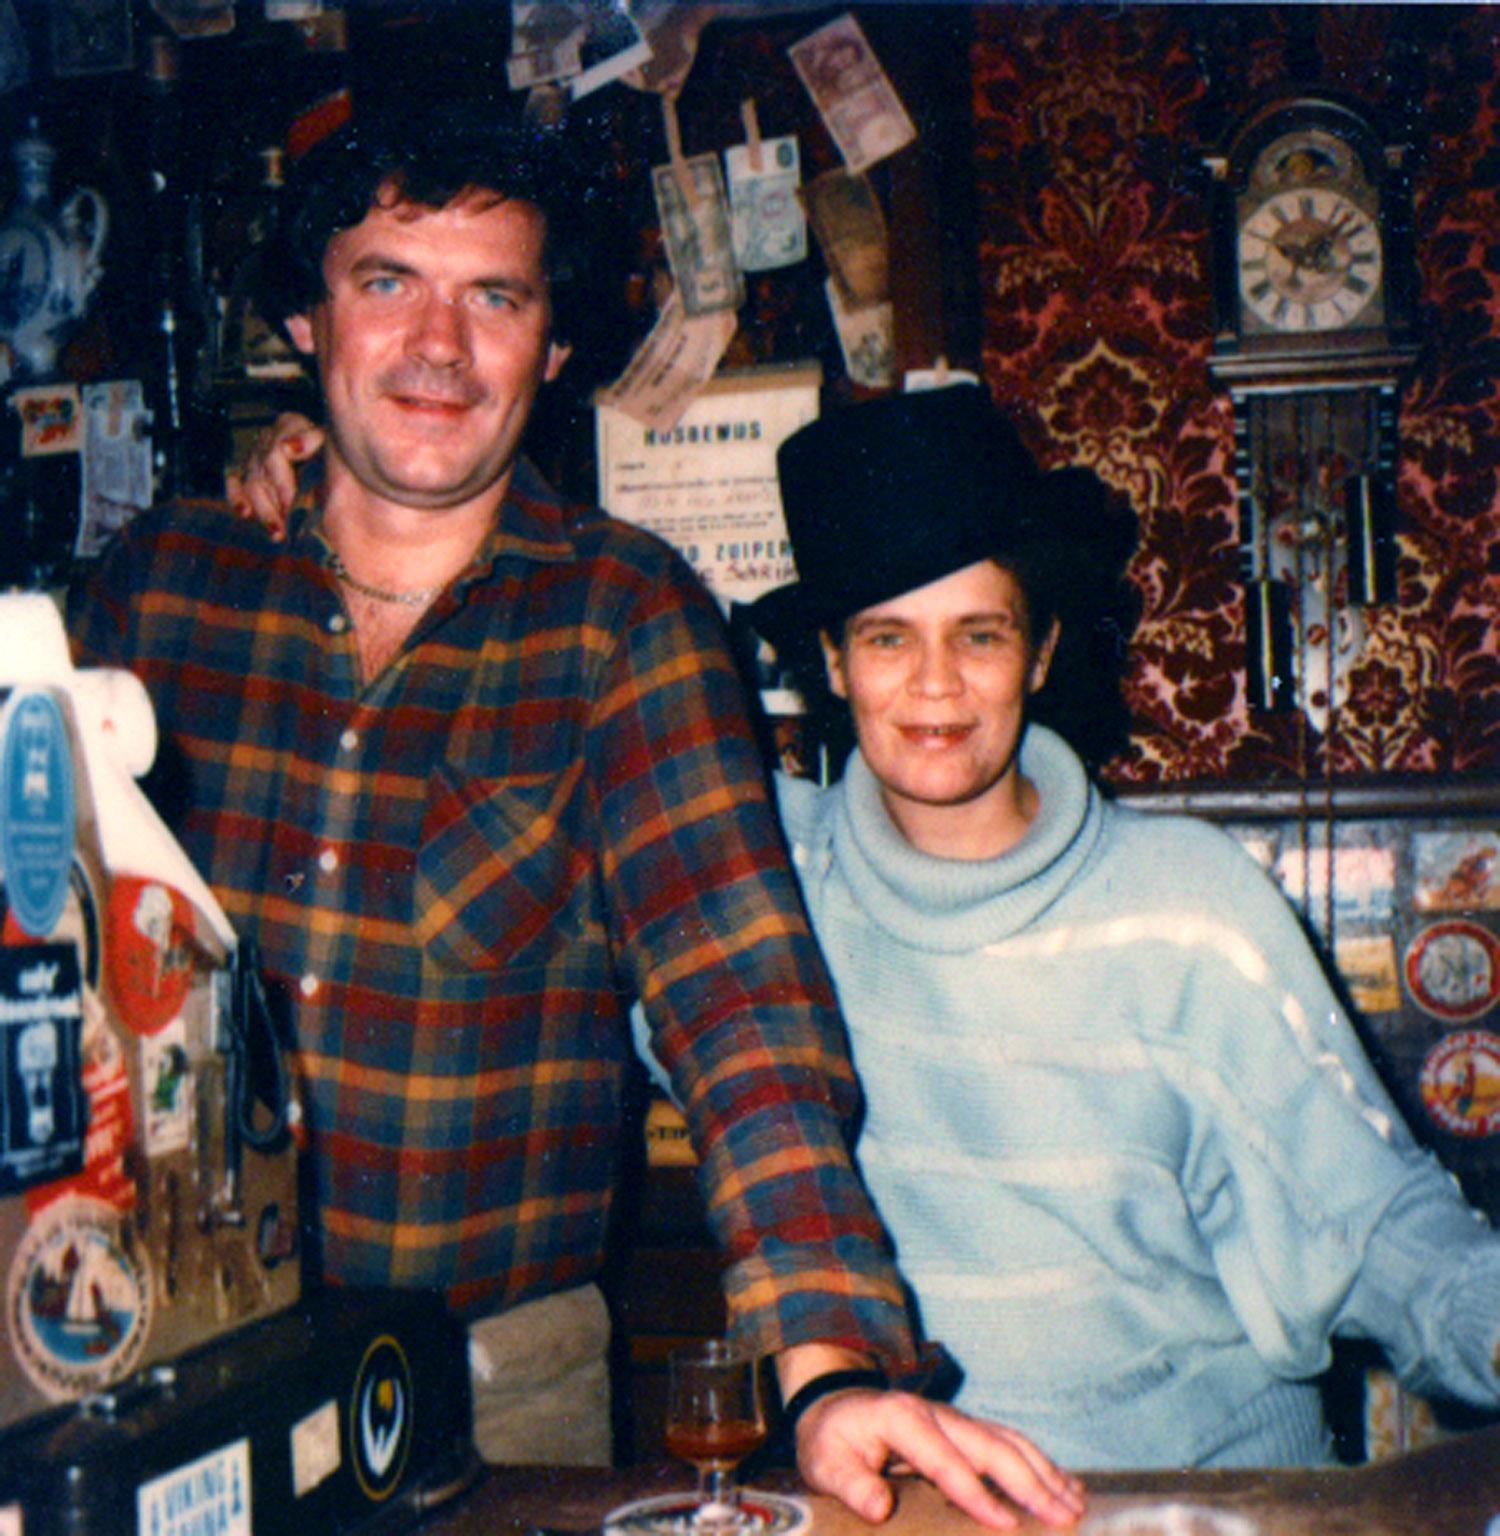 Owner Johan and customer